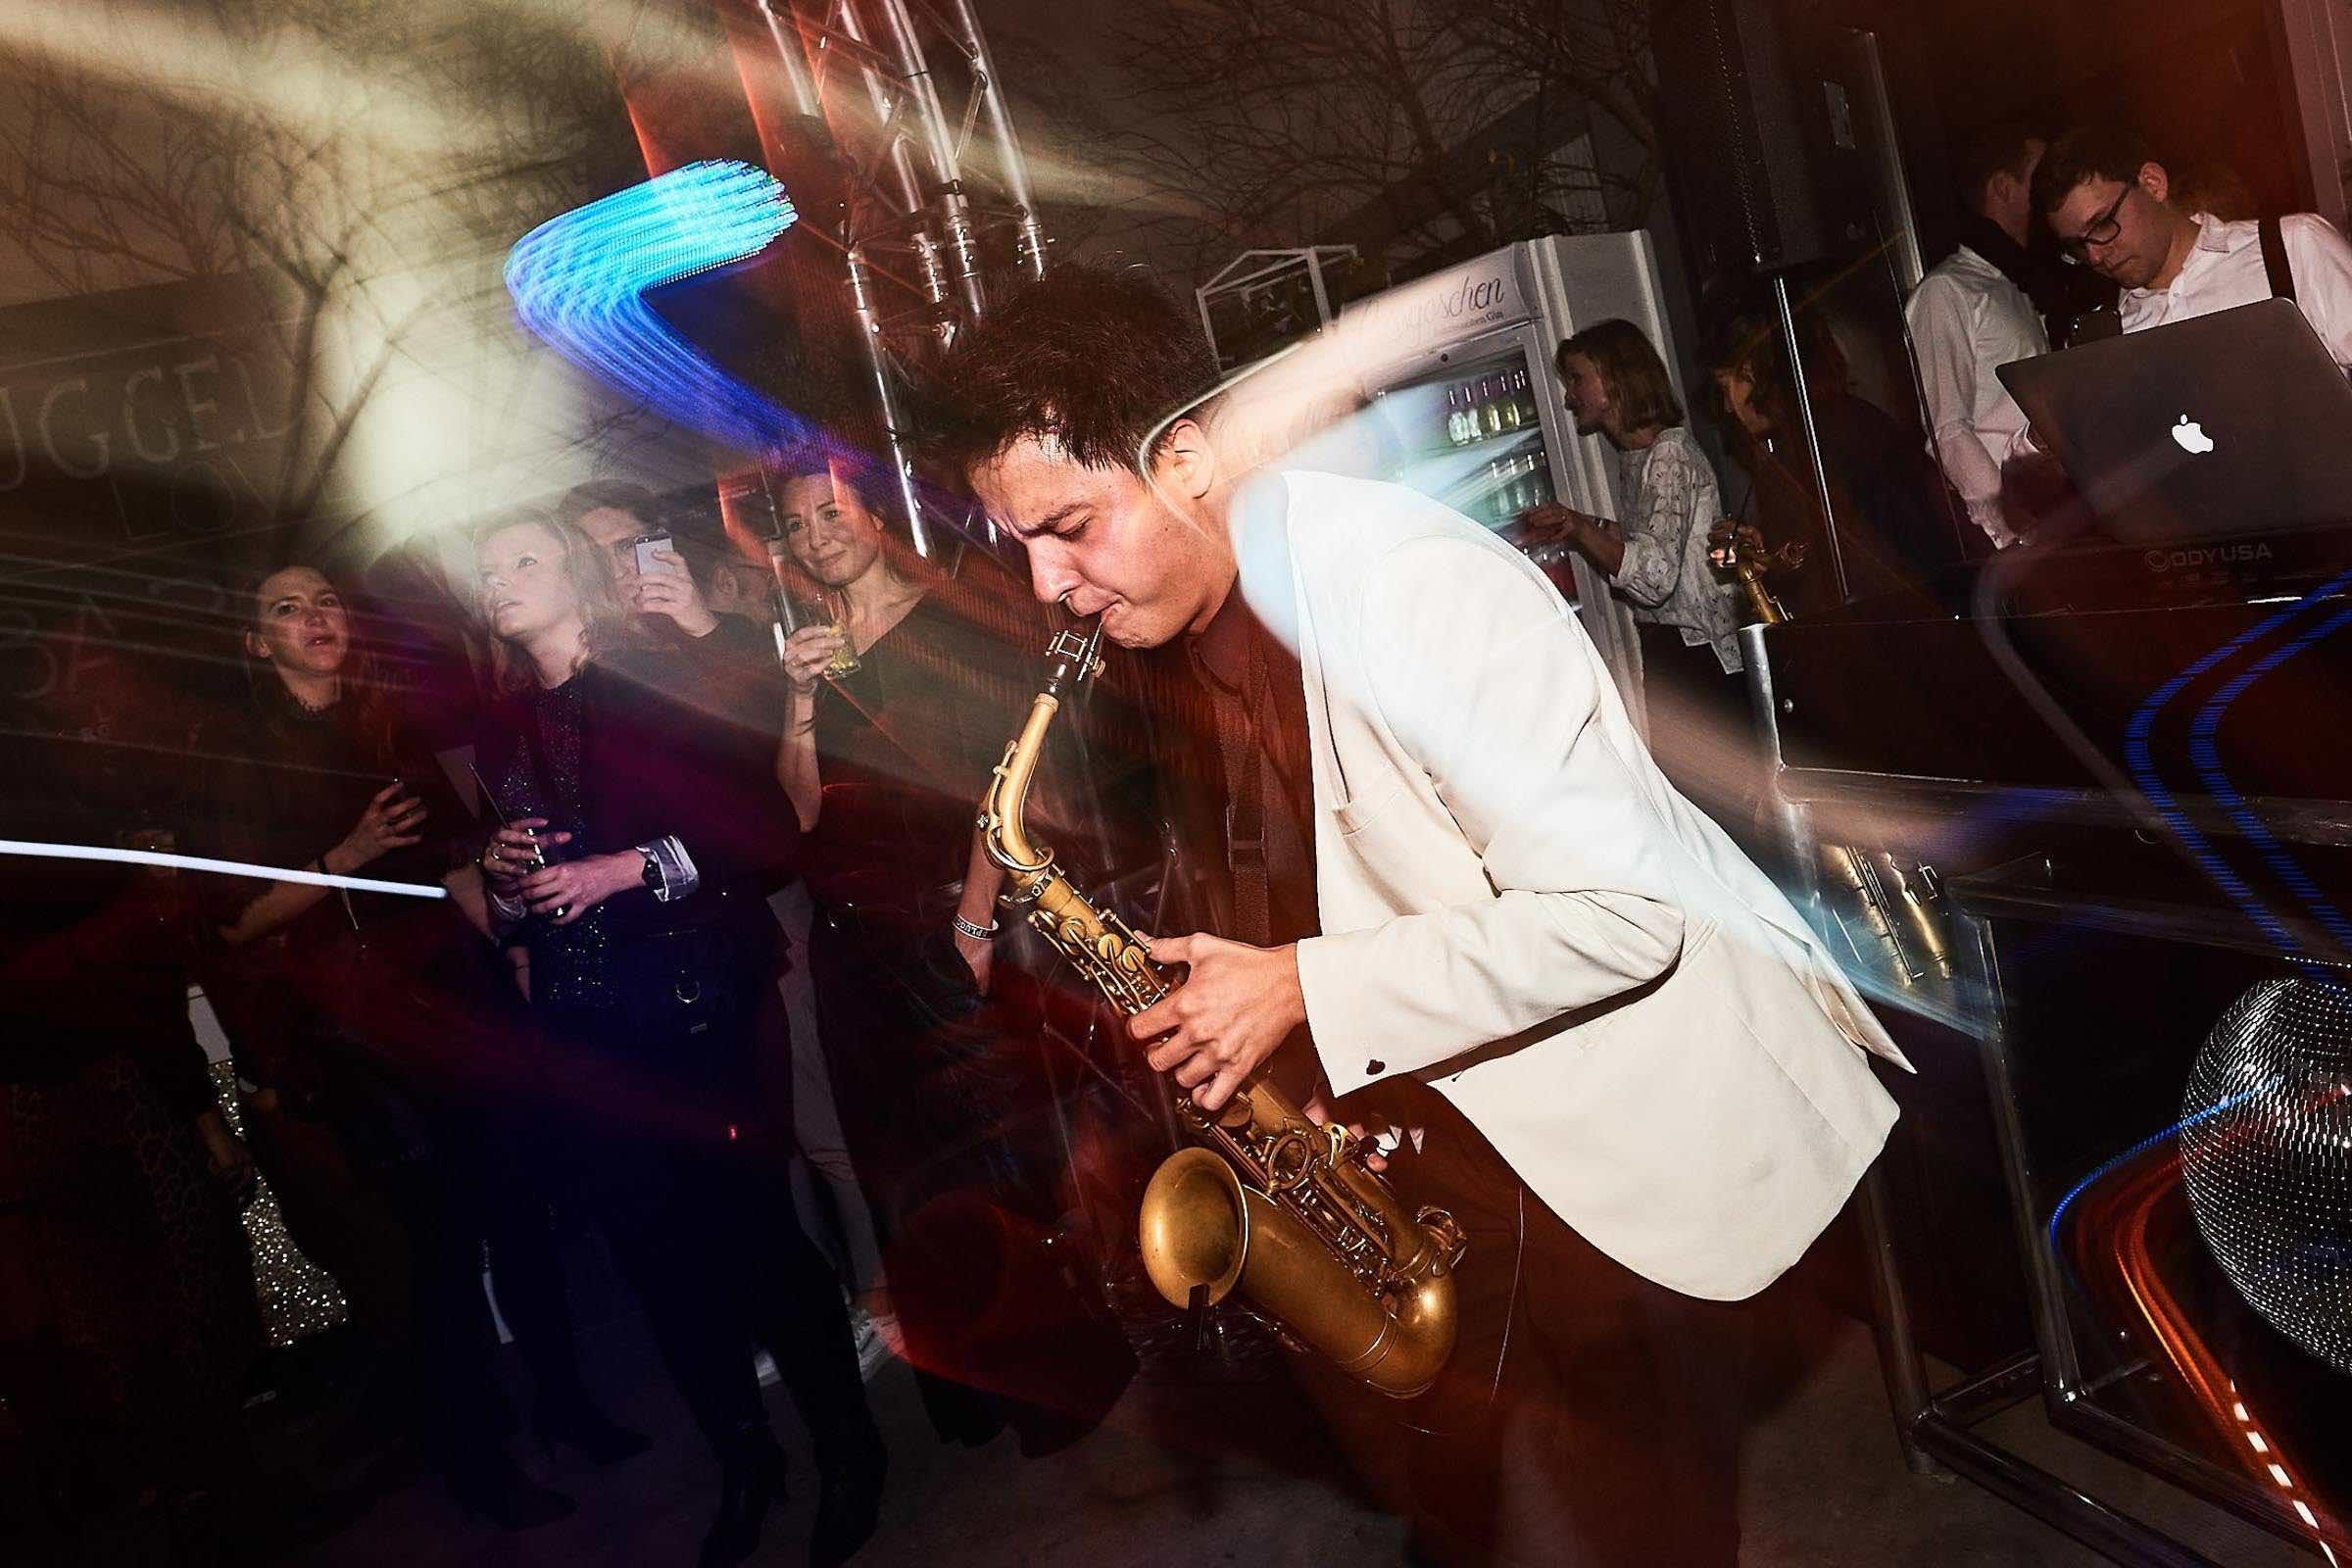 Band | Hamburg | Livemusik | Liveband | Partyband | Jazzband | Discomusik | Swingband | Loungeband | Popband | Saxophonist | Saxophon | Hochzeit | Empfang | Messe | Firmenfeier | Charity | Gala | Buchen | Mieten | Hamburgfeiert